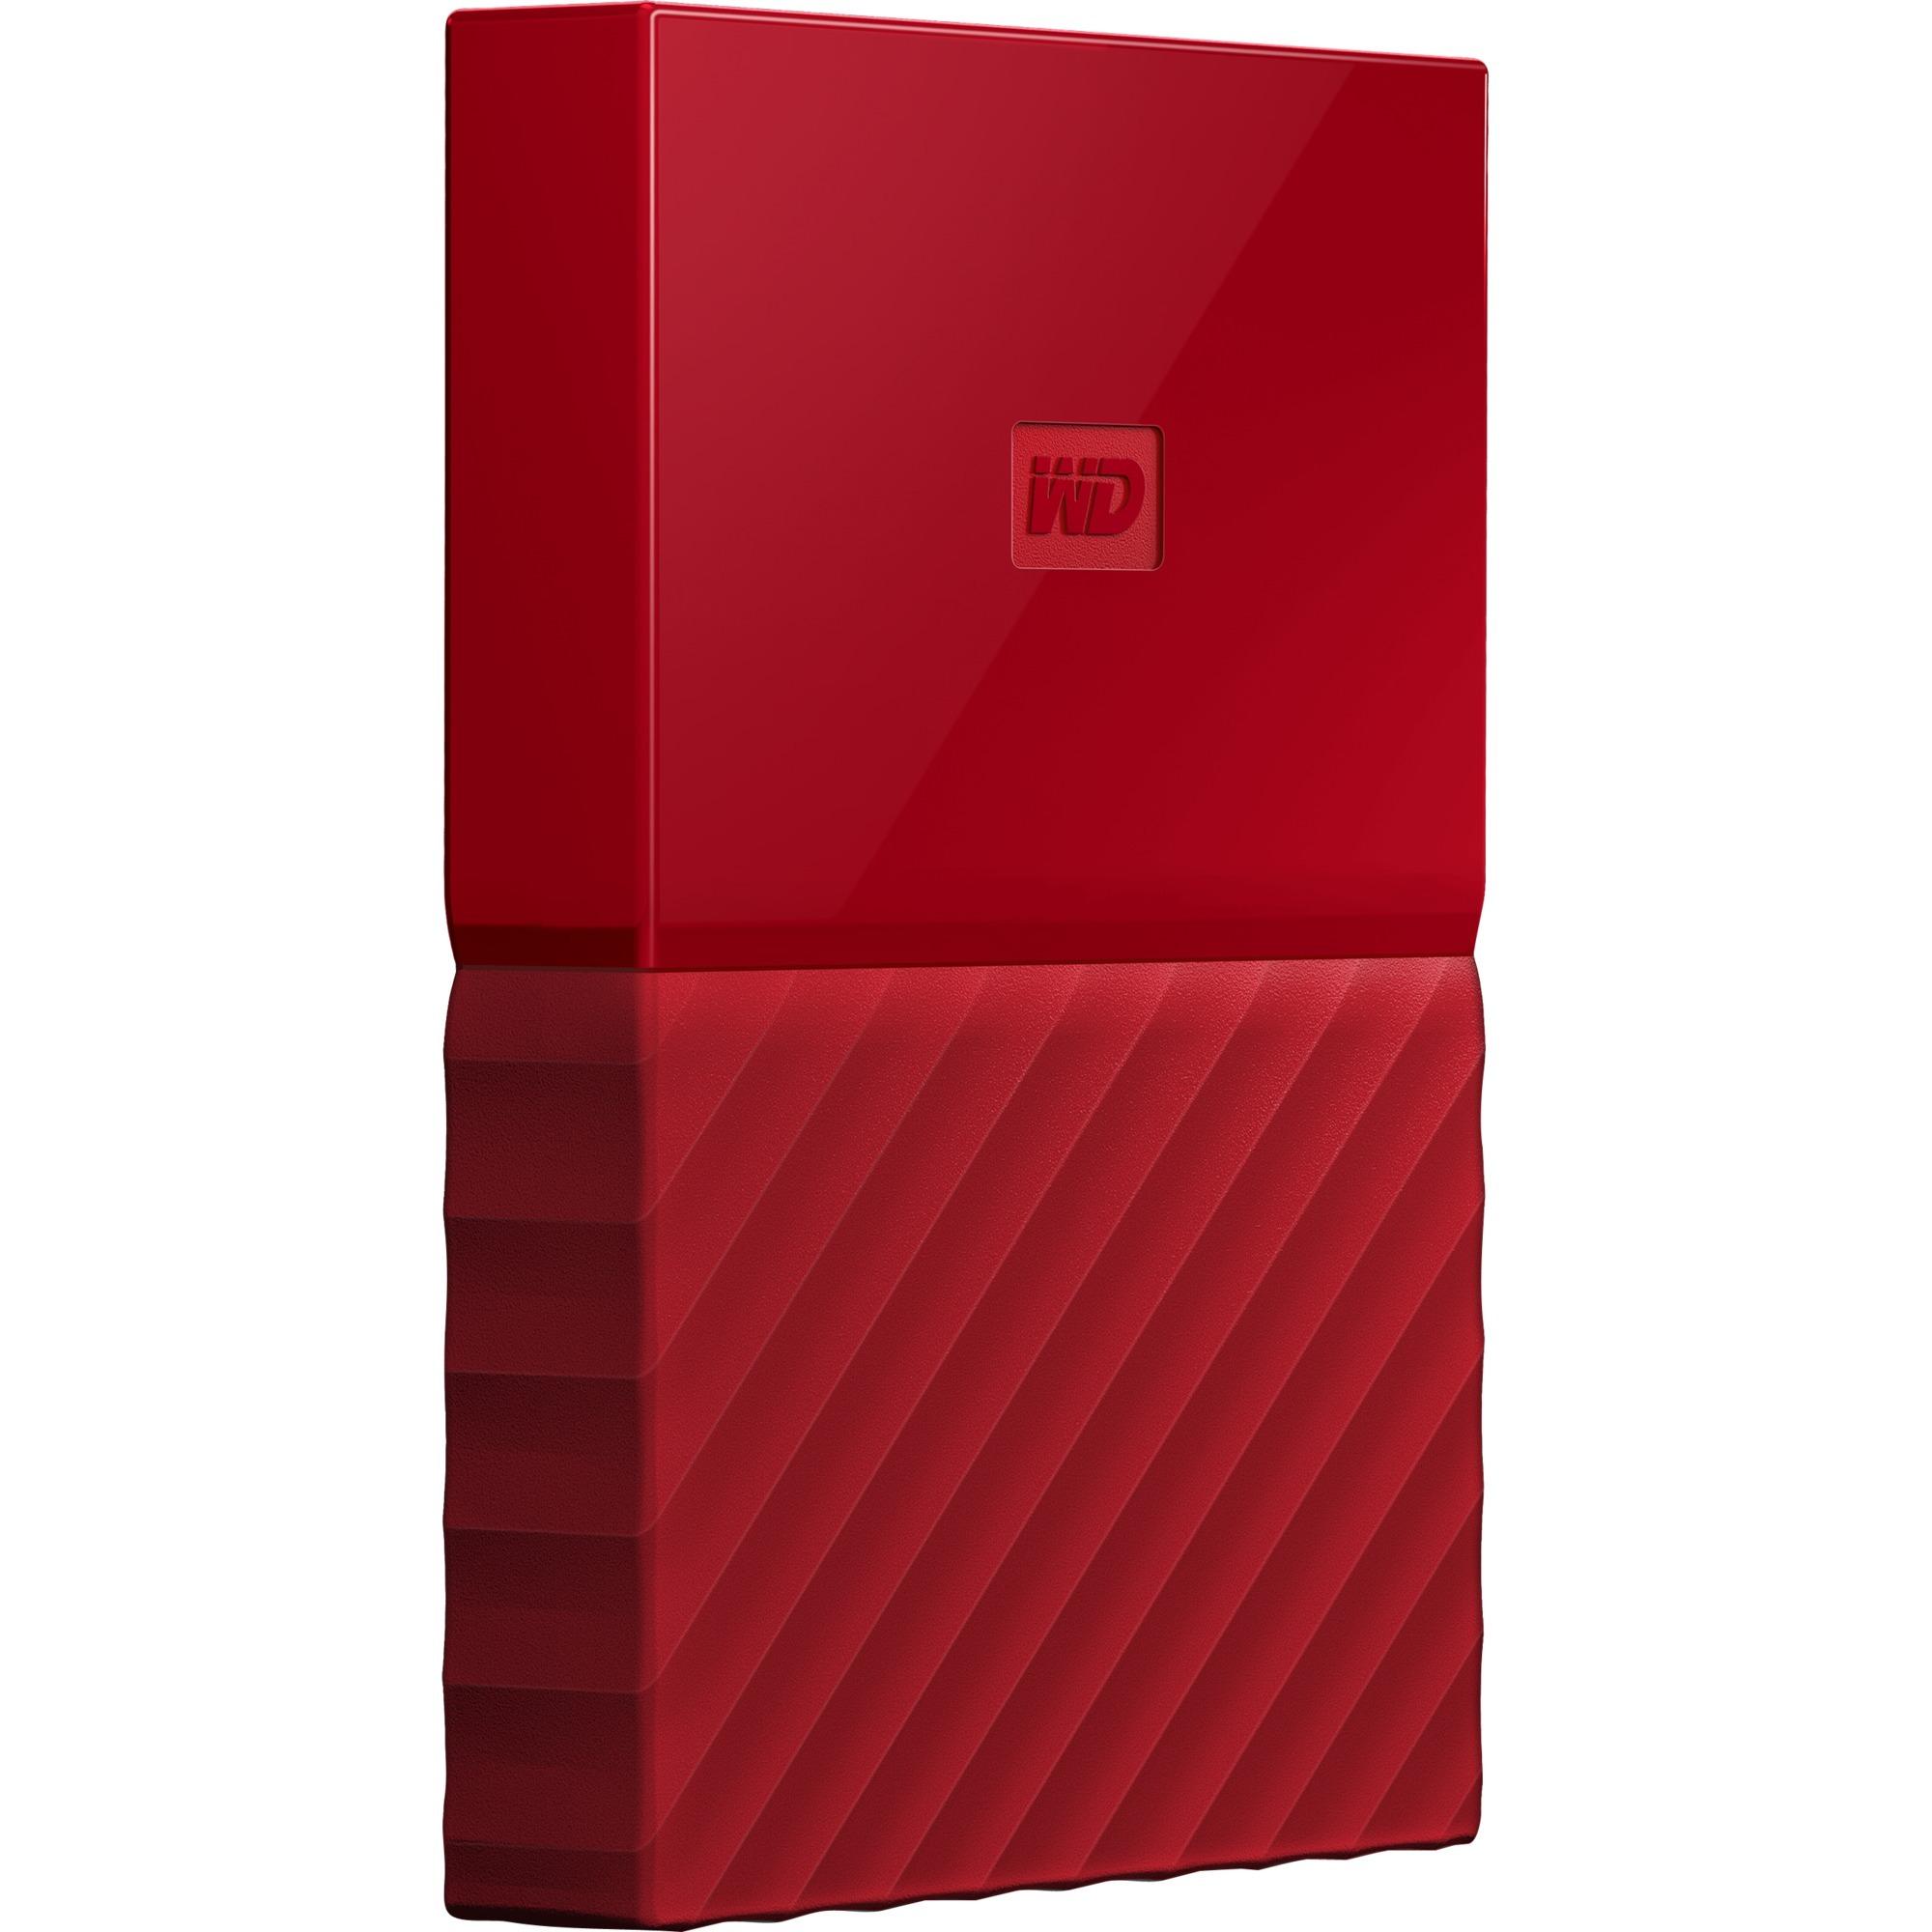 My Passport 2000Go Rouge disque dur externe